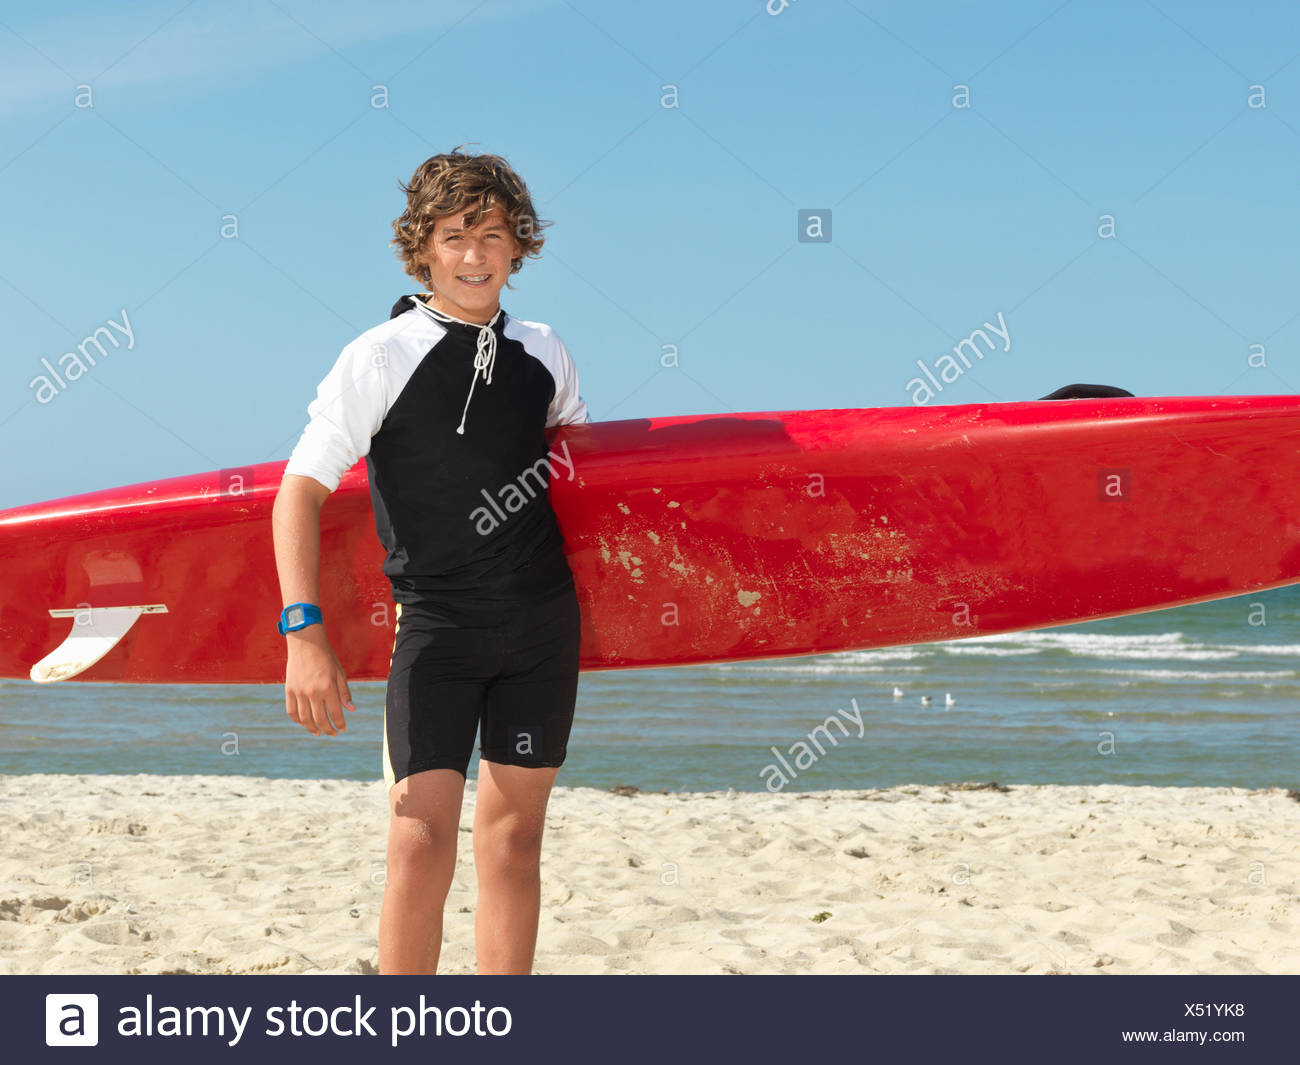 Portrait of teenage boy nipper (child surf life savers) with surfboard, Altona, Melbourne, Australia - Stock Image